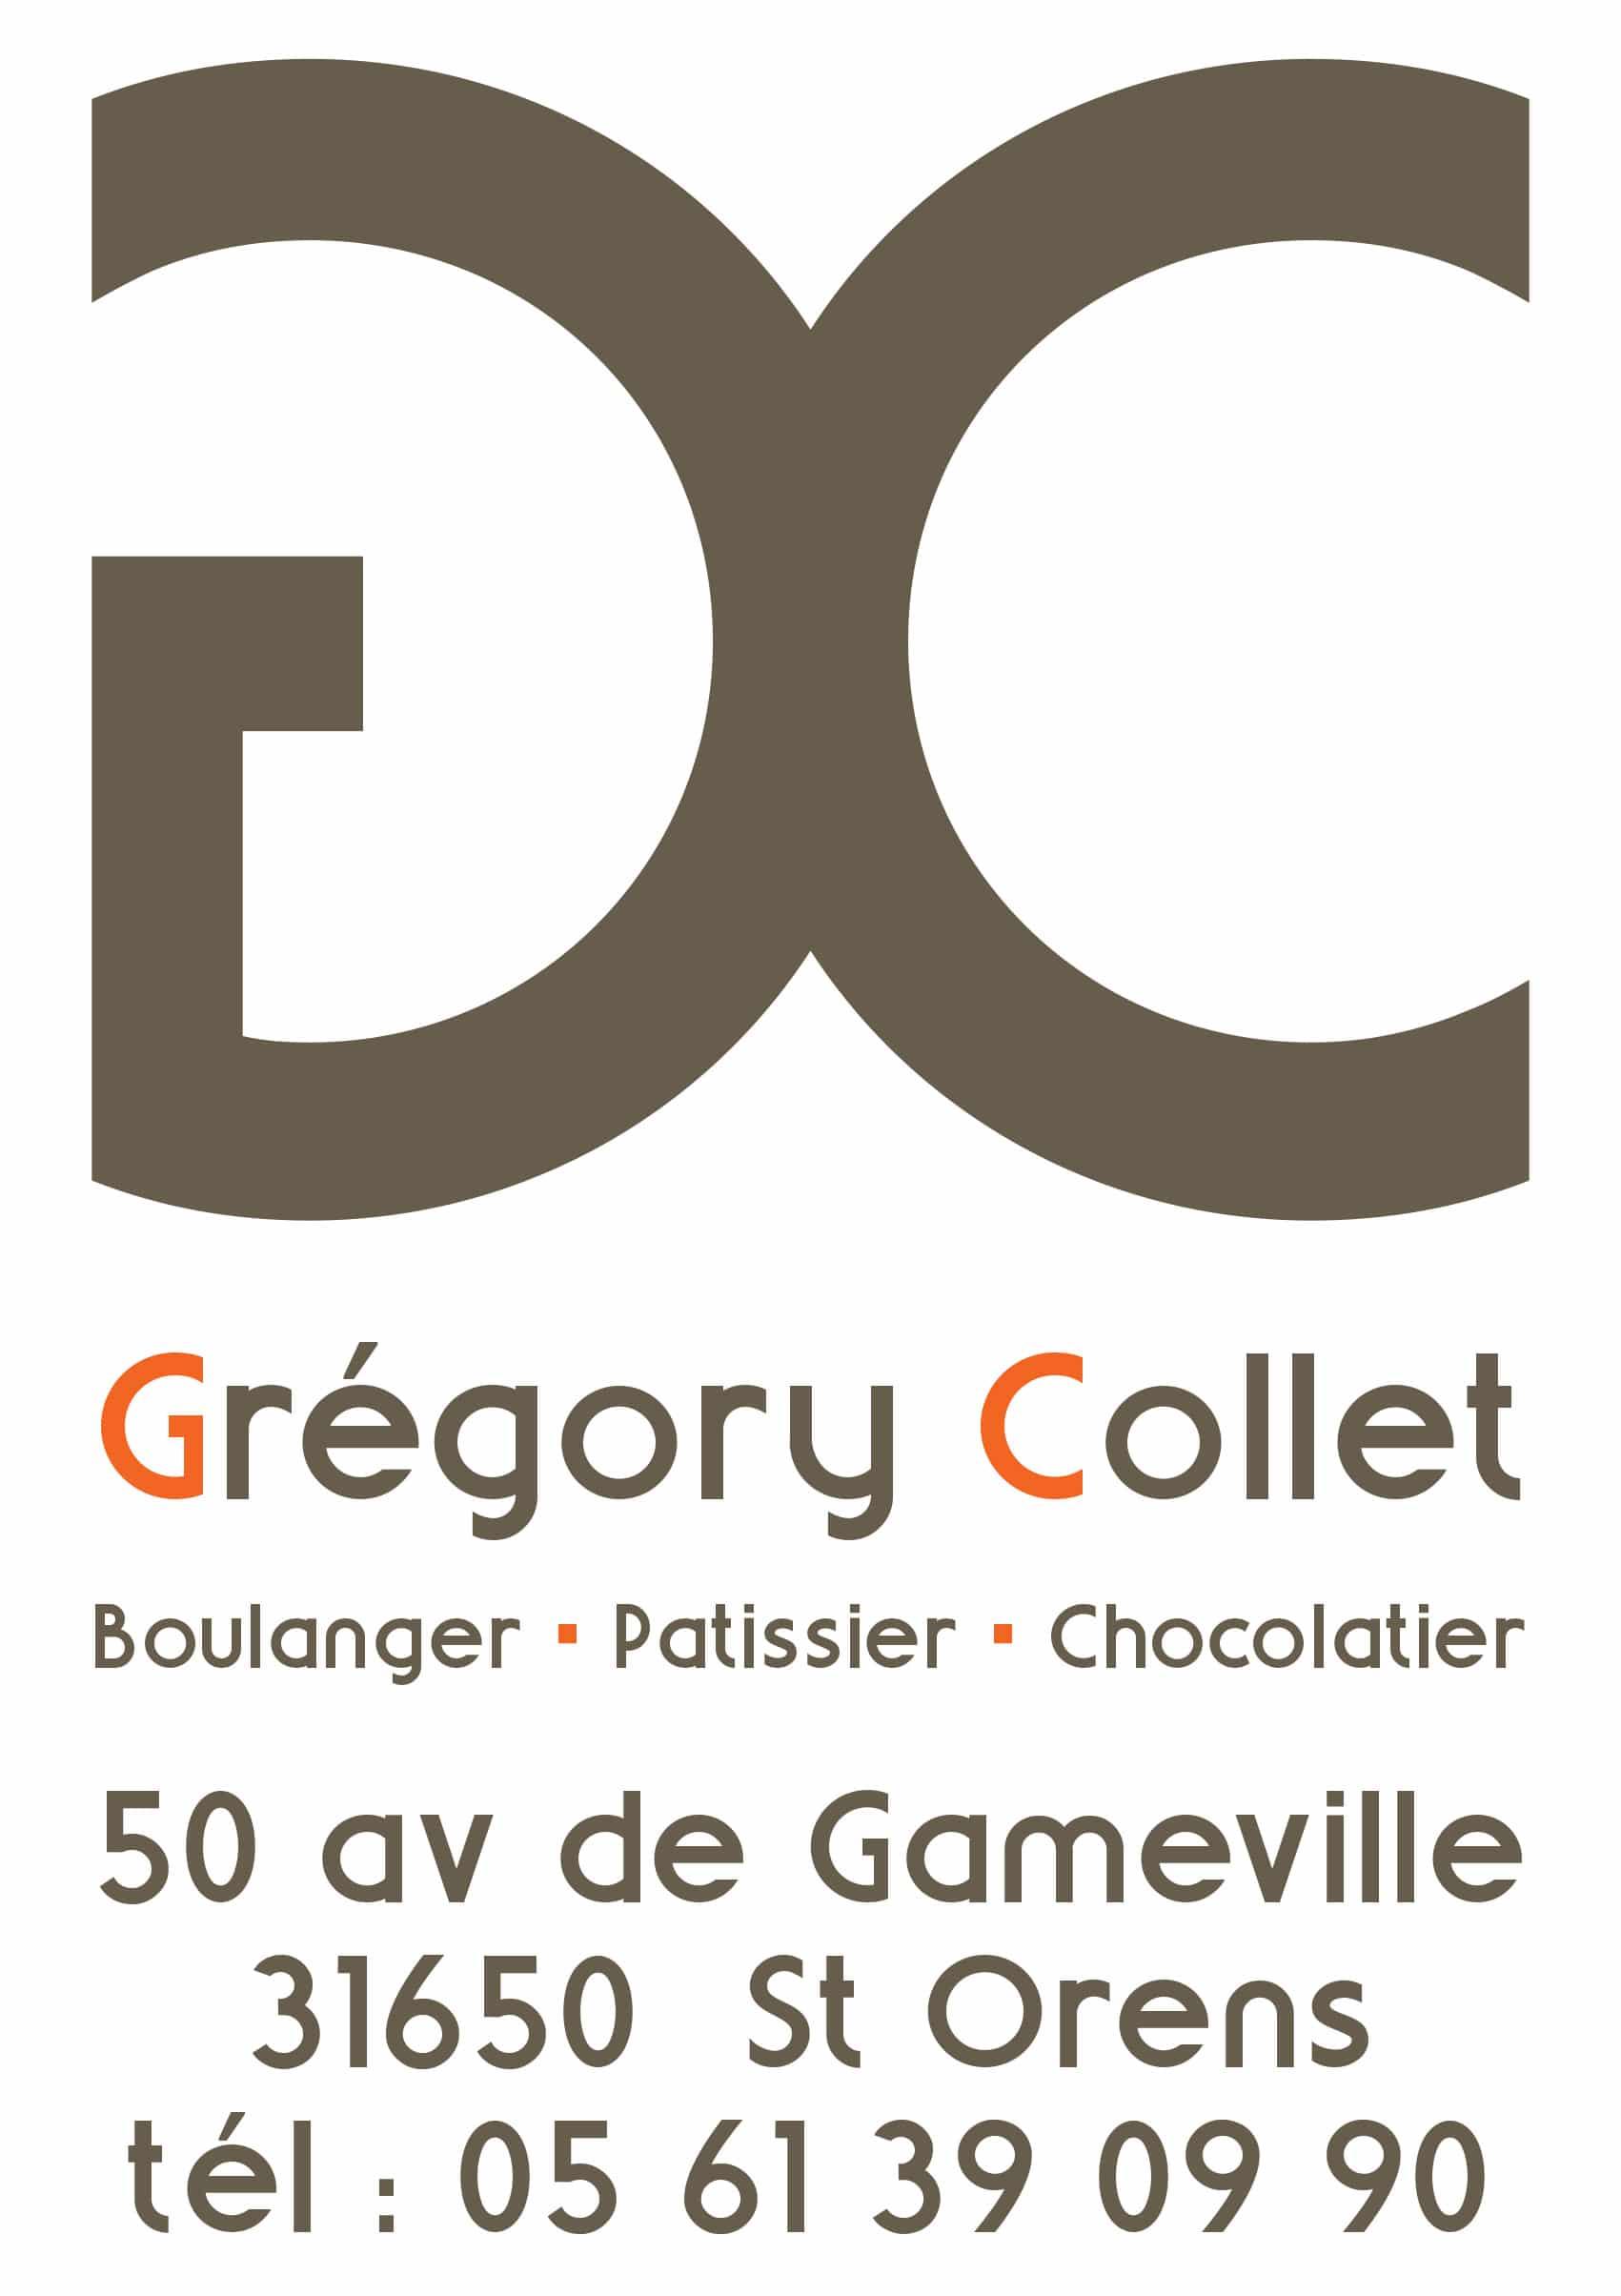 BOULANGERIE GREGORY COLLET